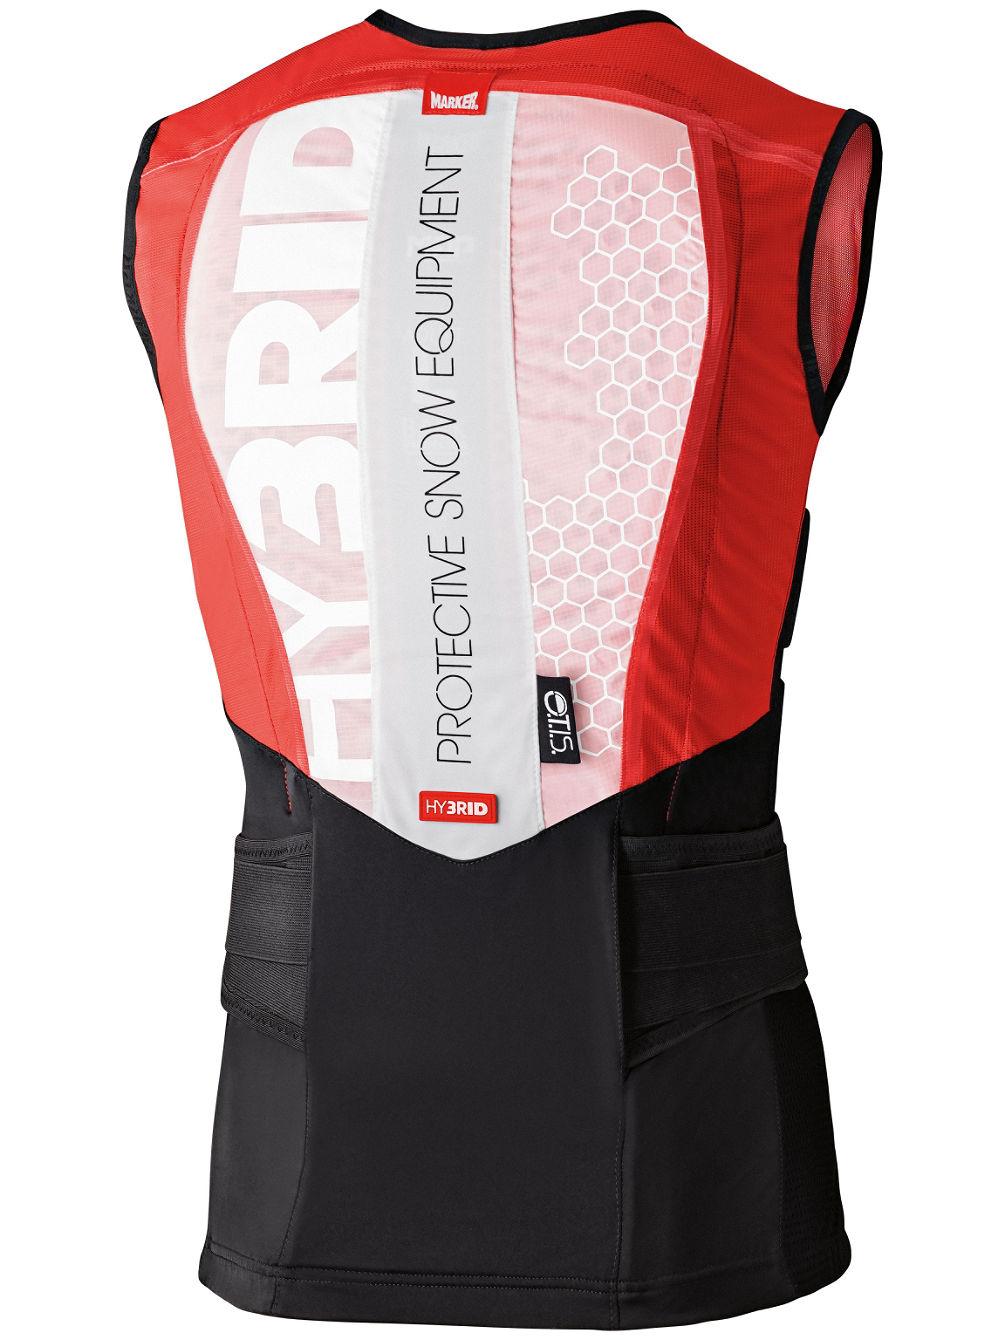 marker-hybrid-215-otis-body-vest